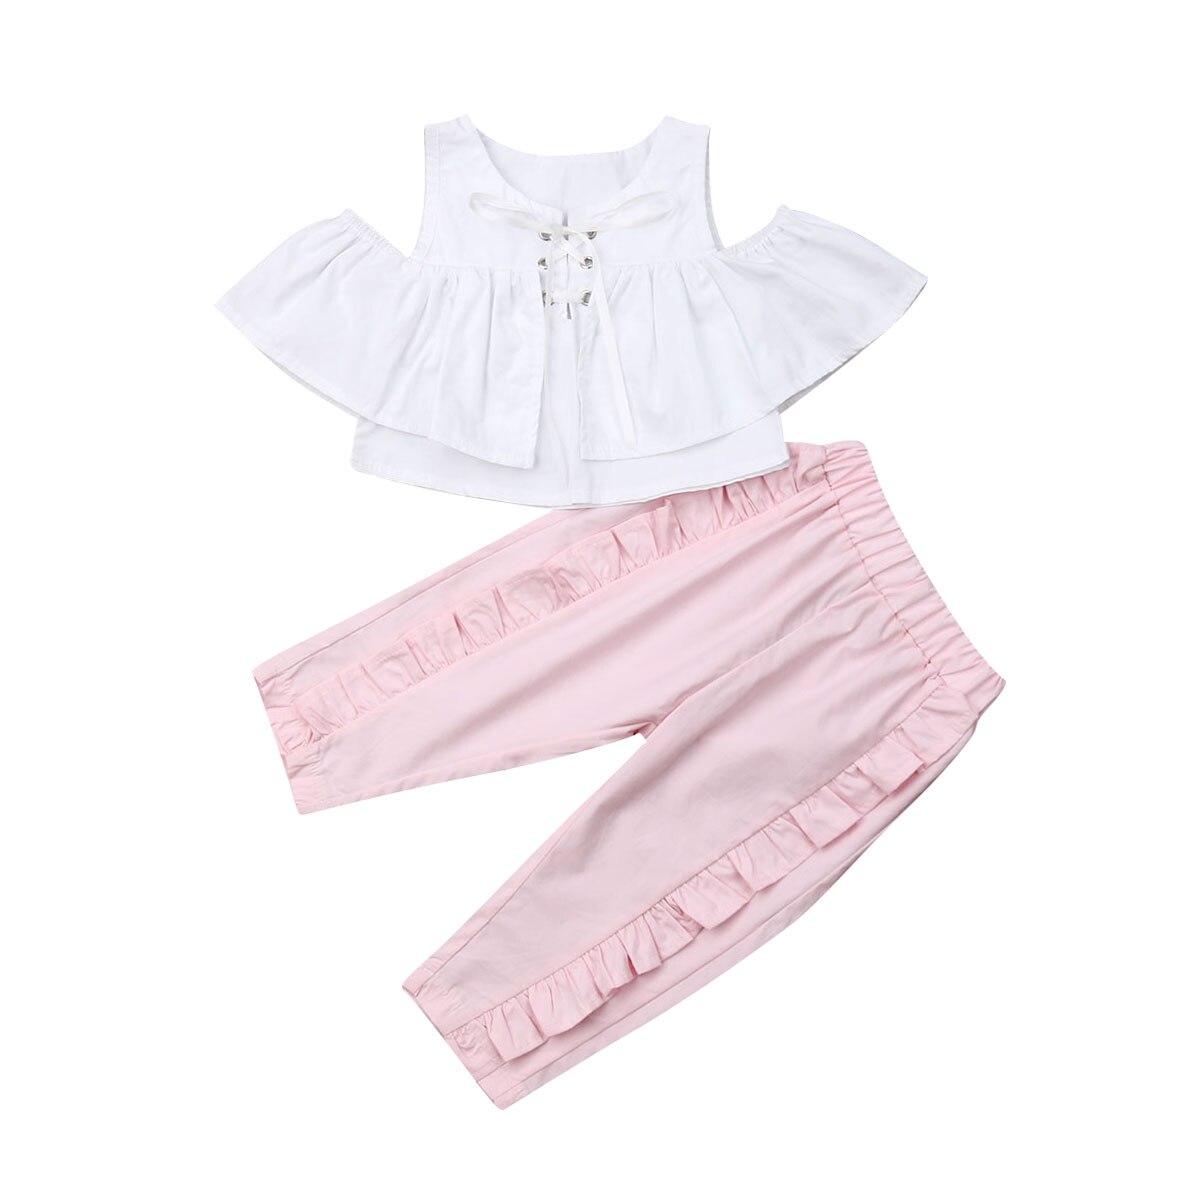 1-6Y Toddler Kid Girls Clothing Set White Ruffles Lace Up T Shirt Top + Pants Summer Children Girls Costumes